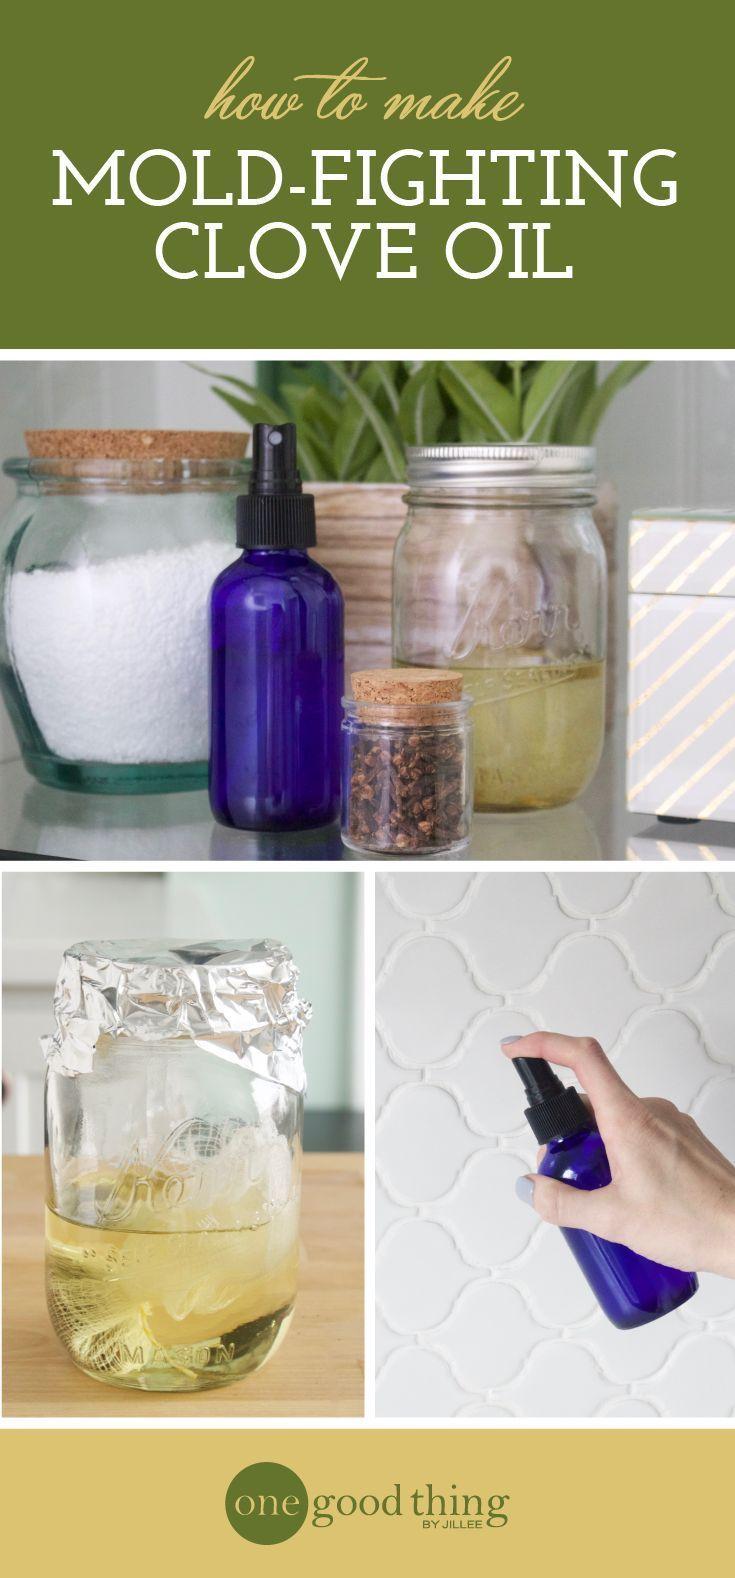 best 25 clove oil ideas on pinterest clove oil uses clove essential oil and essential oil uses. Black Bedroom Furniture Sets. Home Design Ideas